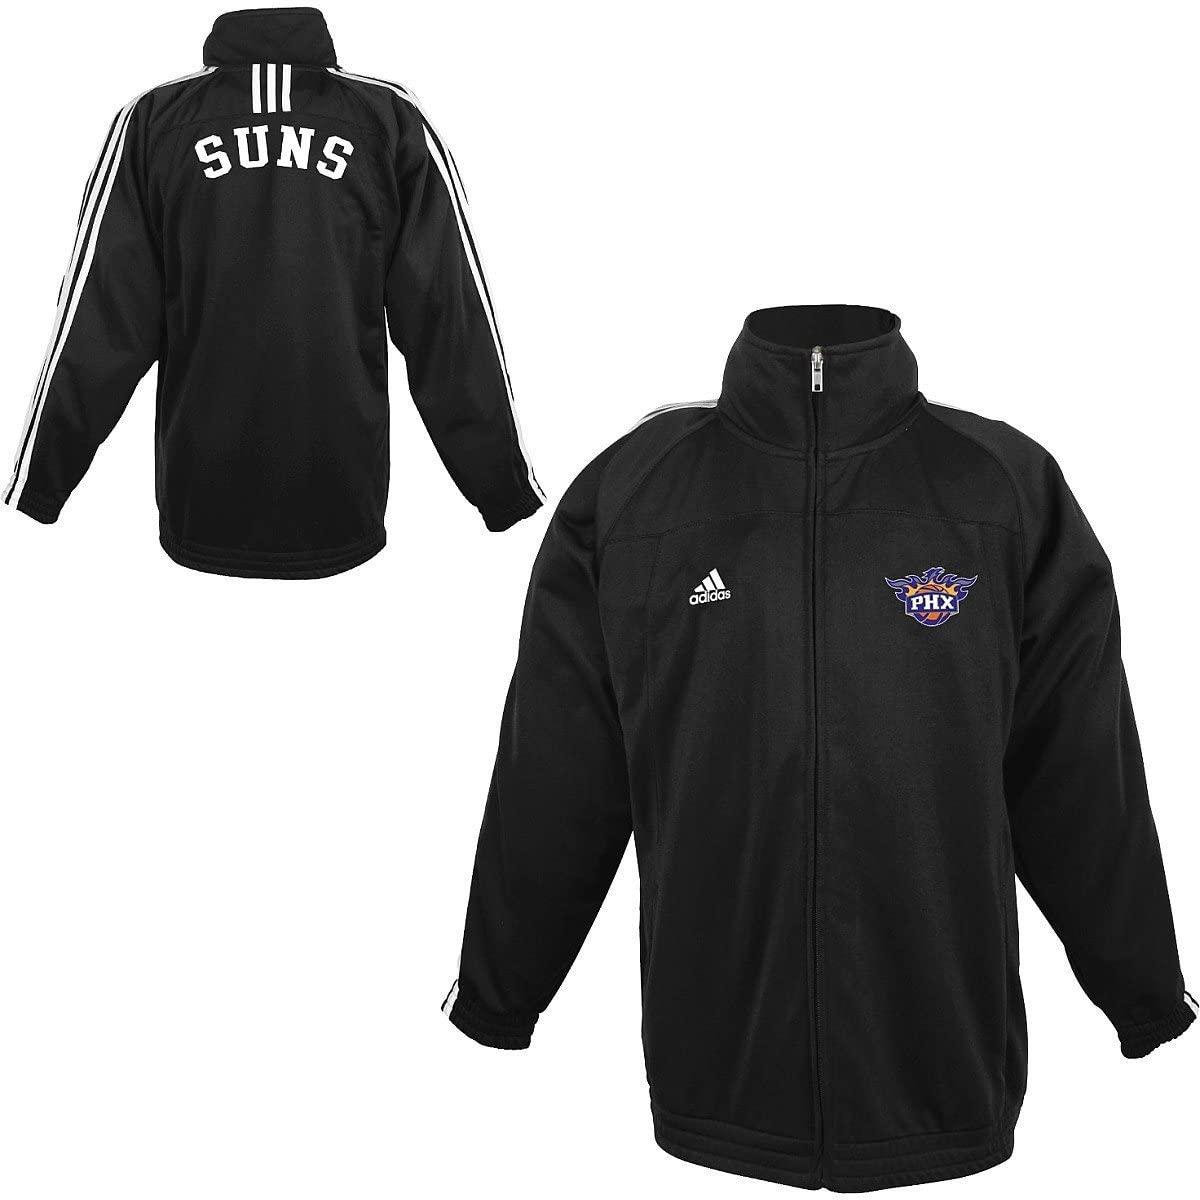 Phoenix Suns NBA Basketball Youth Track Jacket, Black